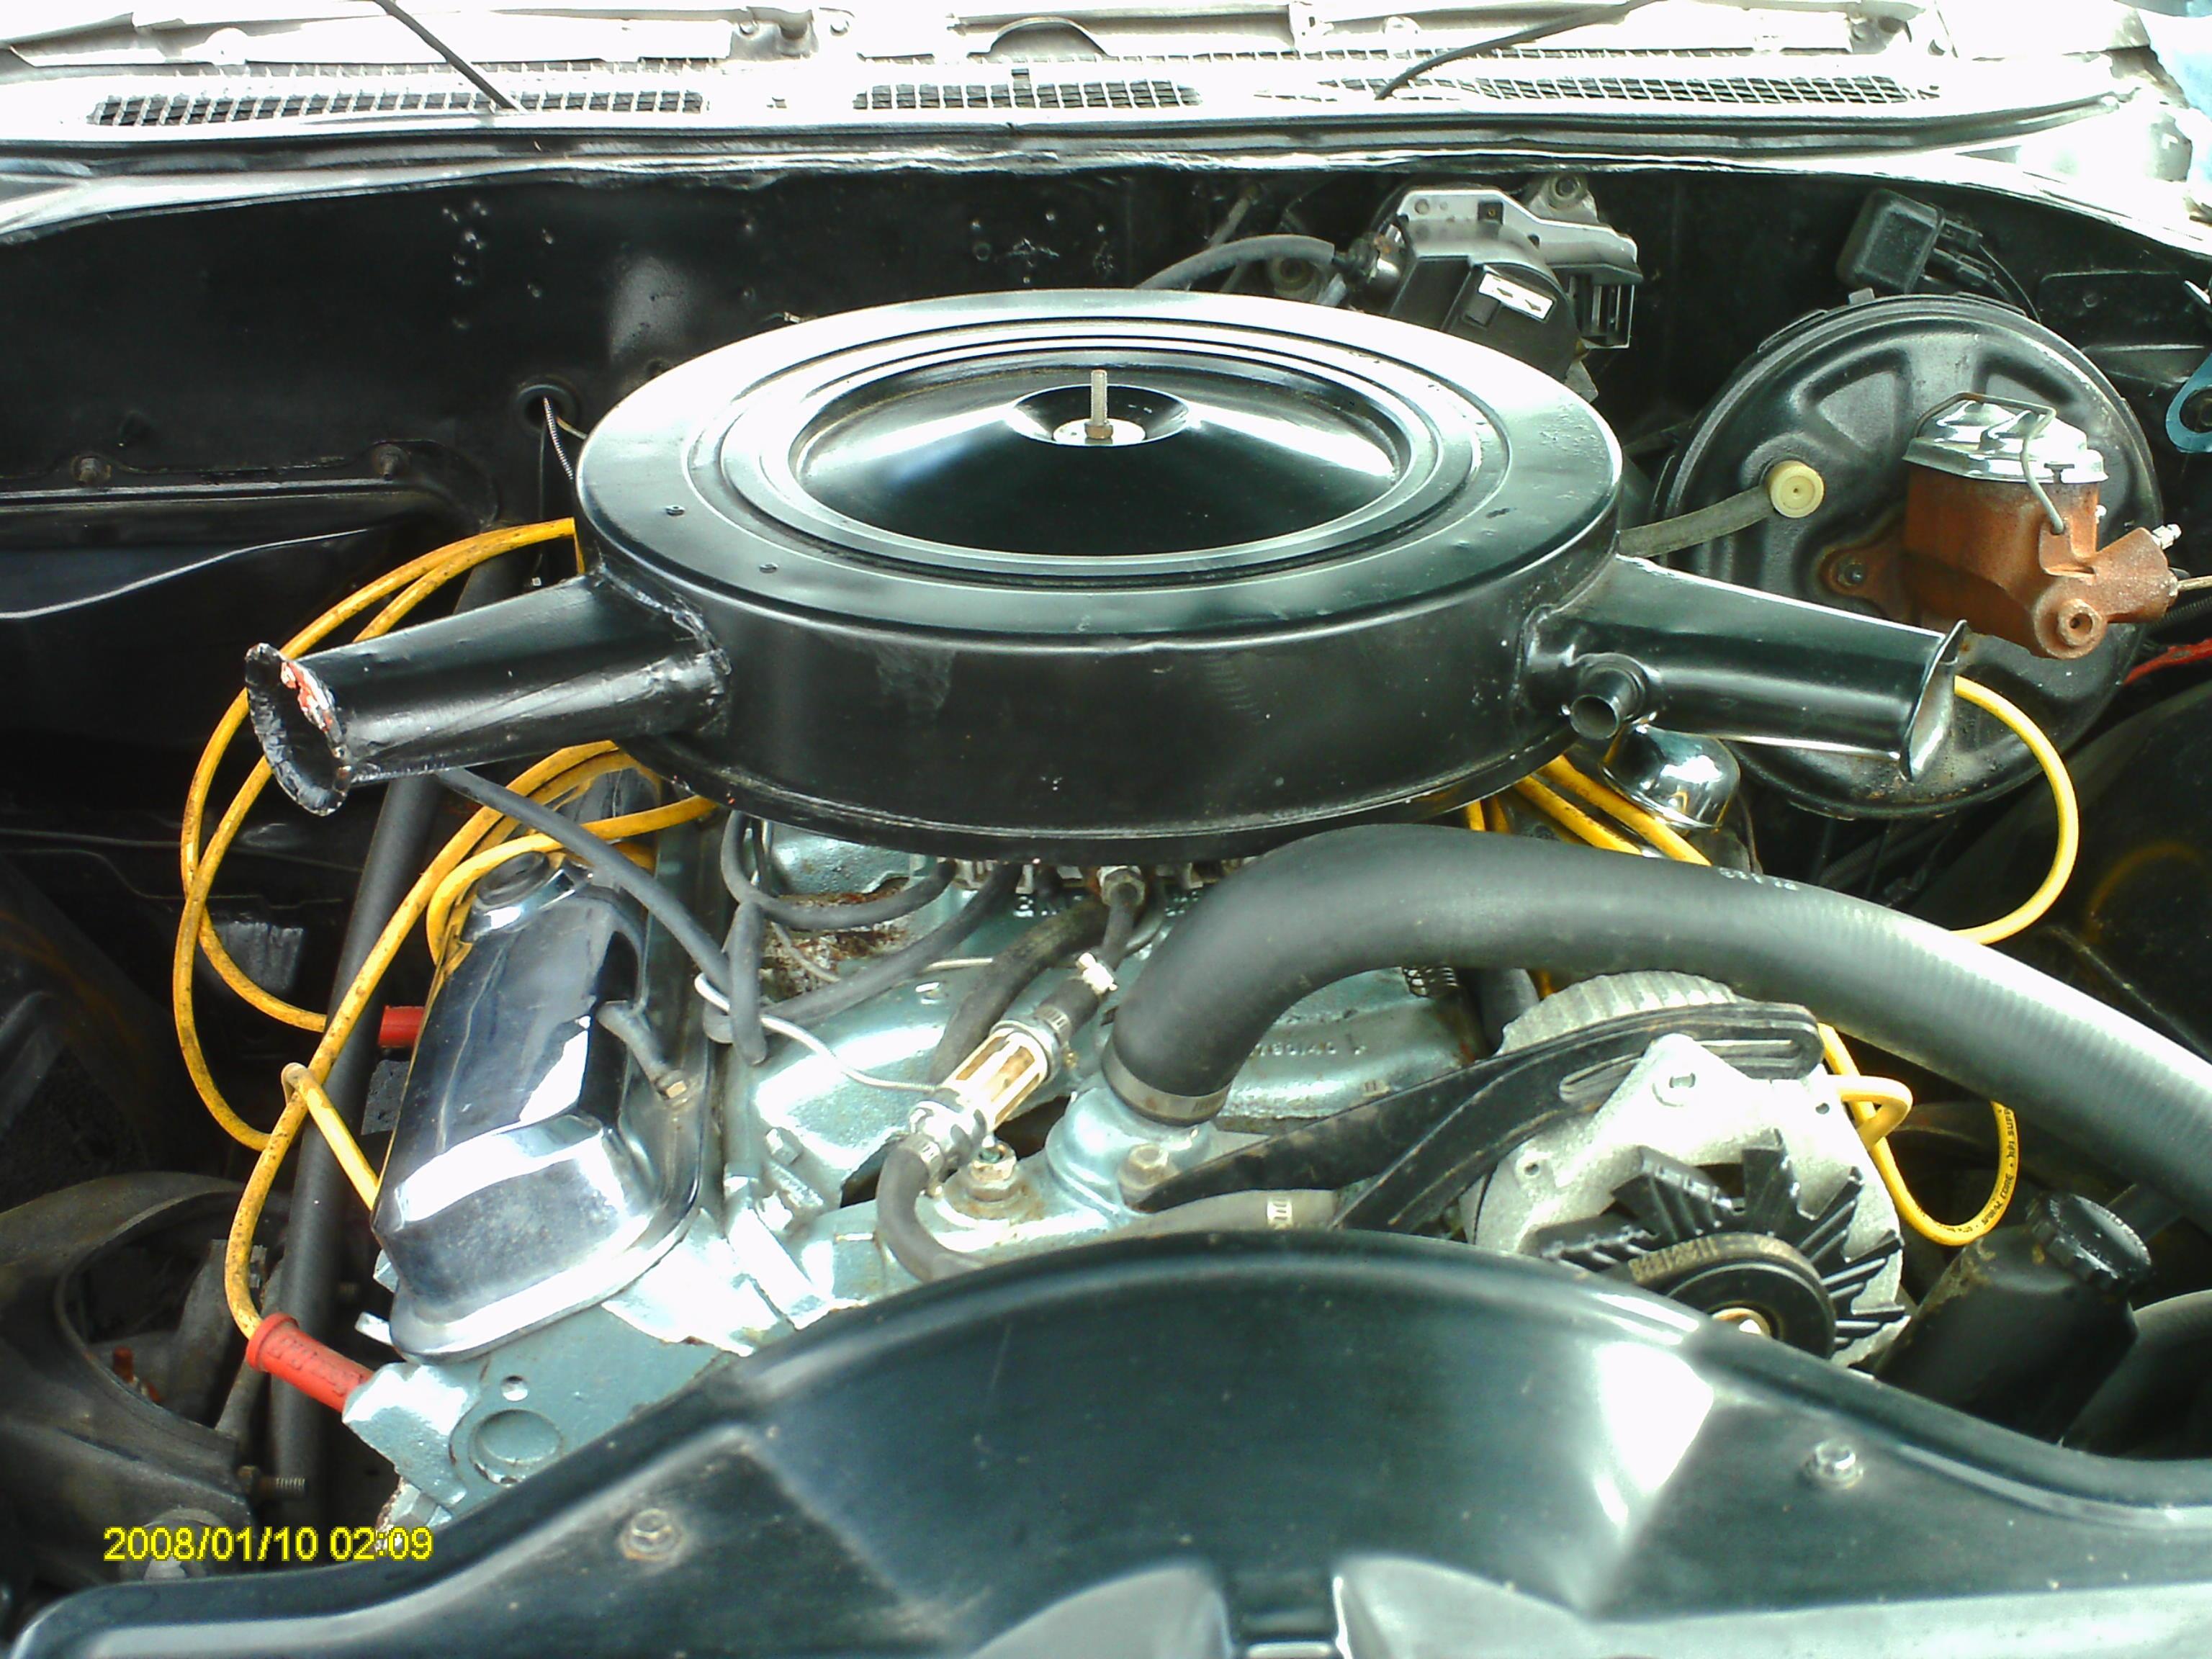 Fully Restored 1968 Pontiac GTO Convertible-1968-gto-convertible008.jpg